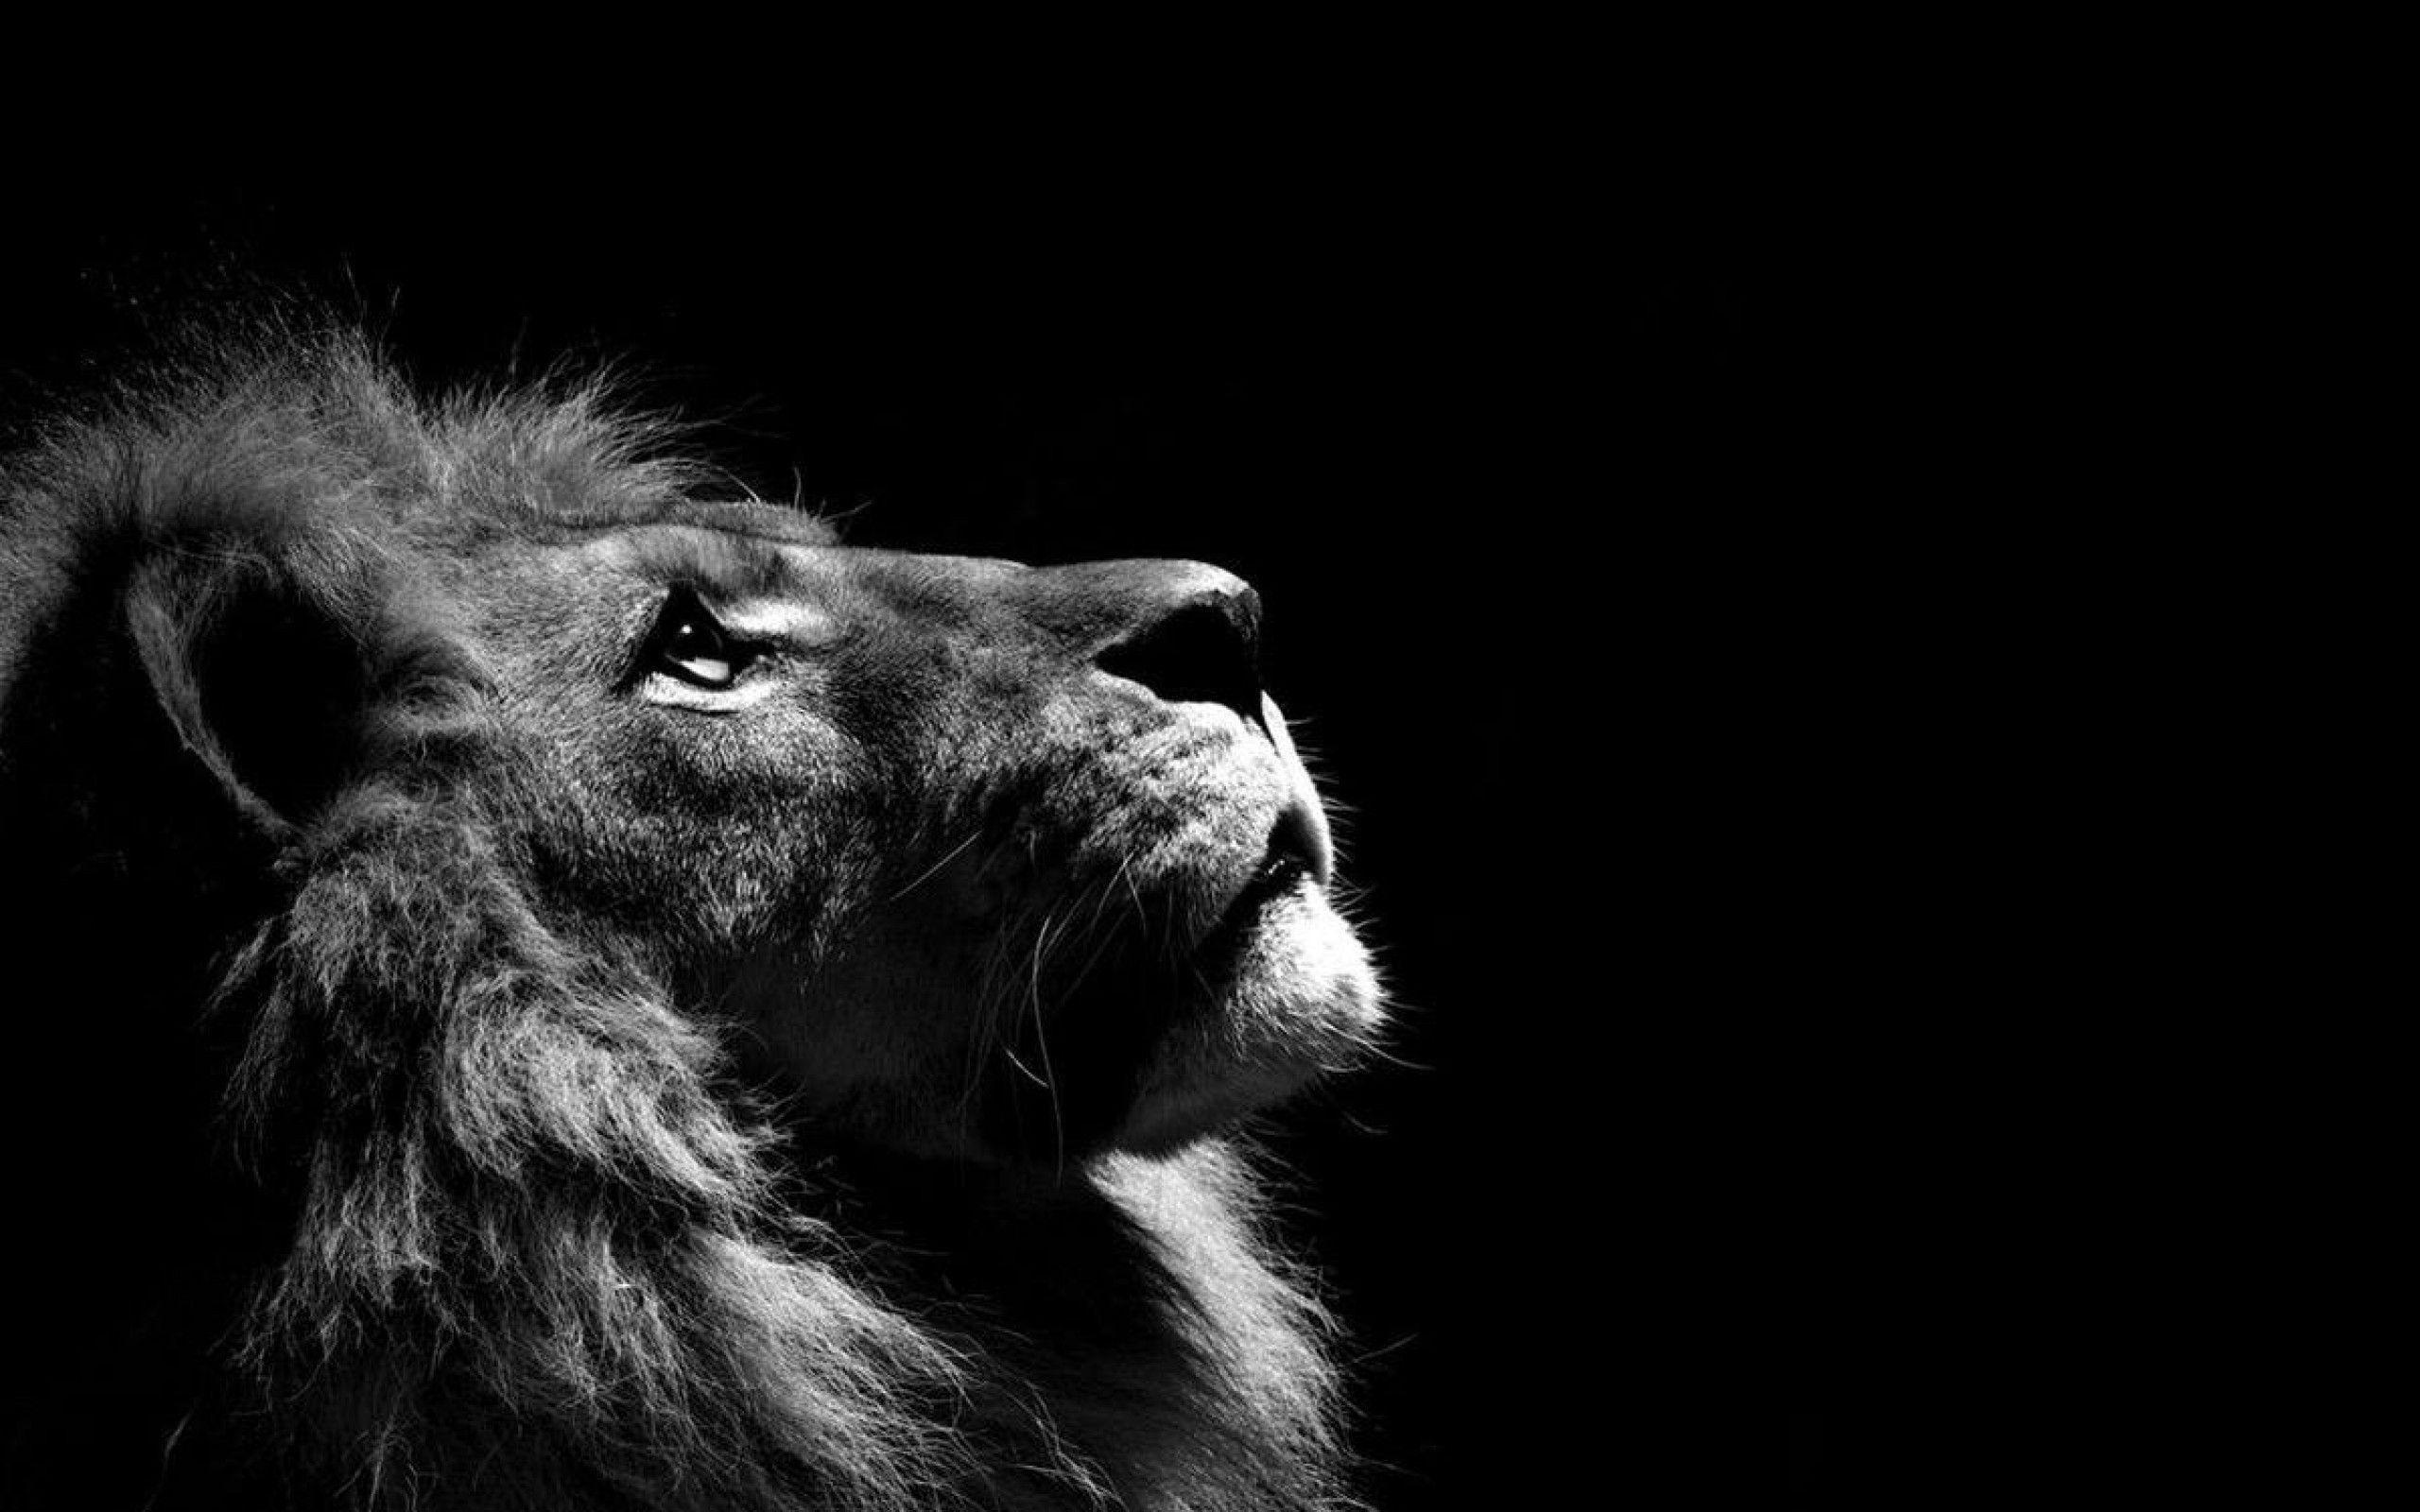 Unduh 75 Wallpaper Hd Lion Gratis